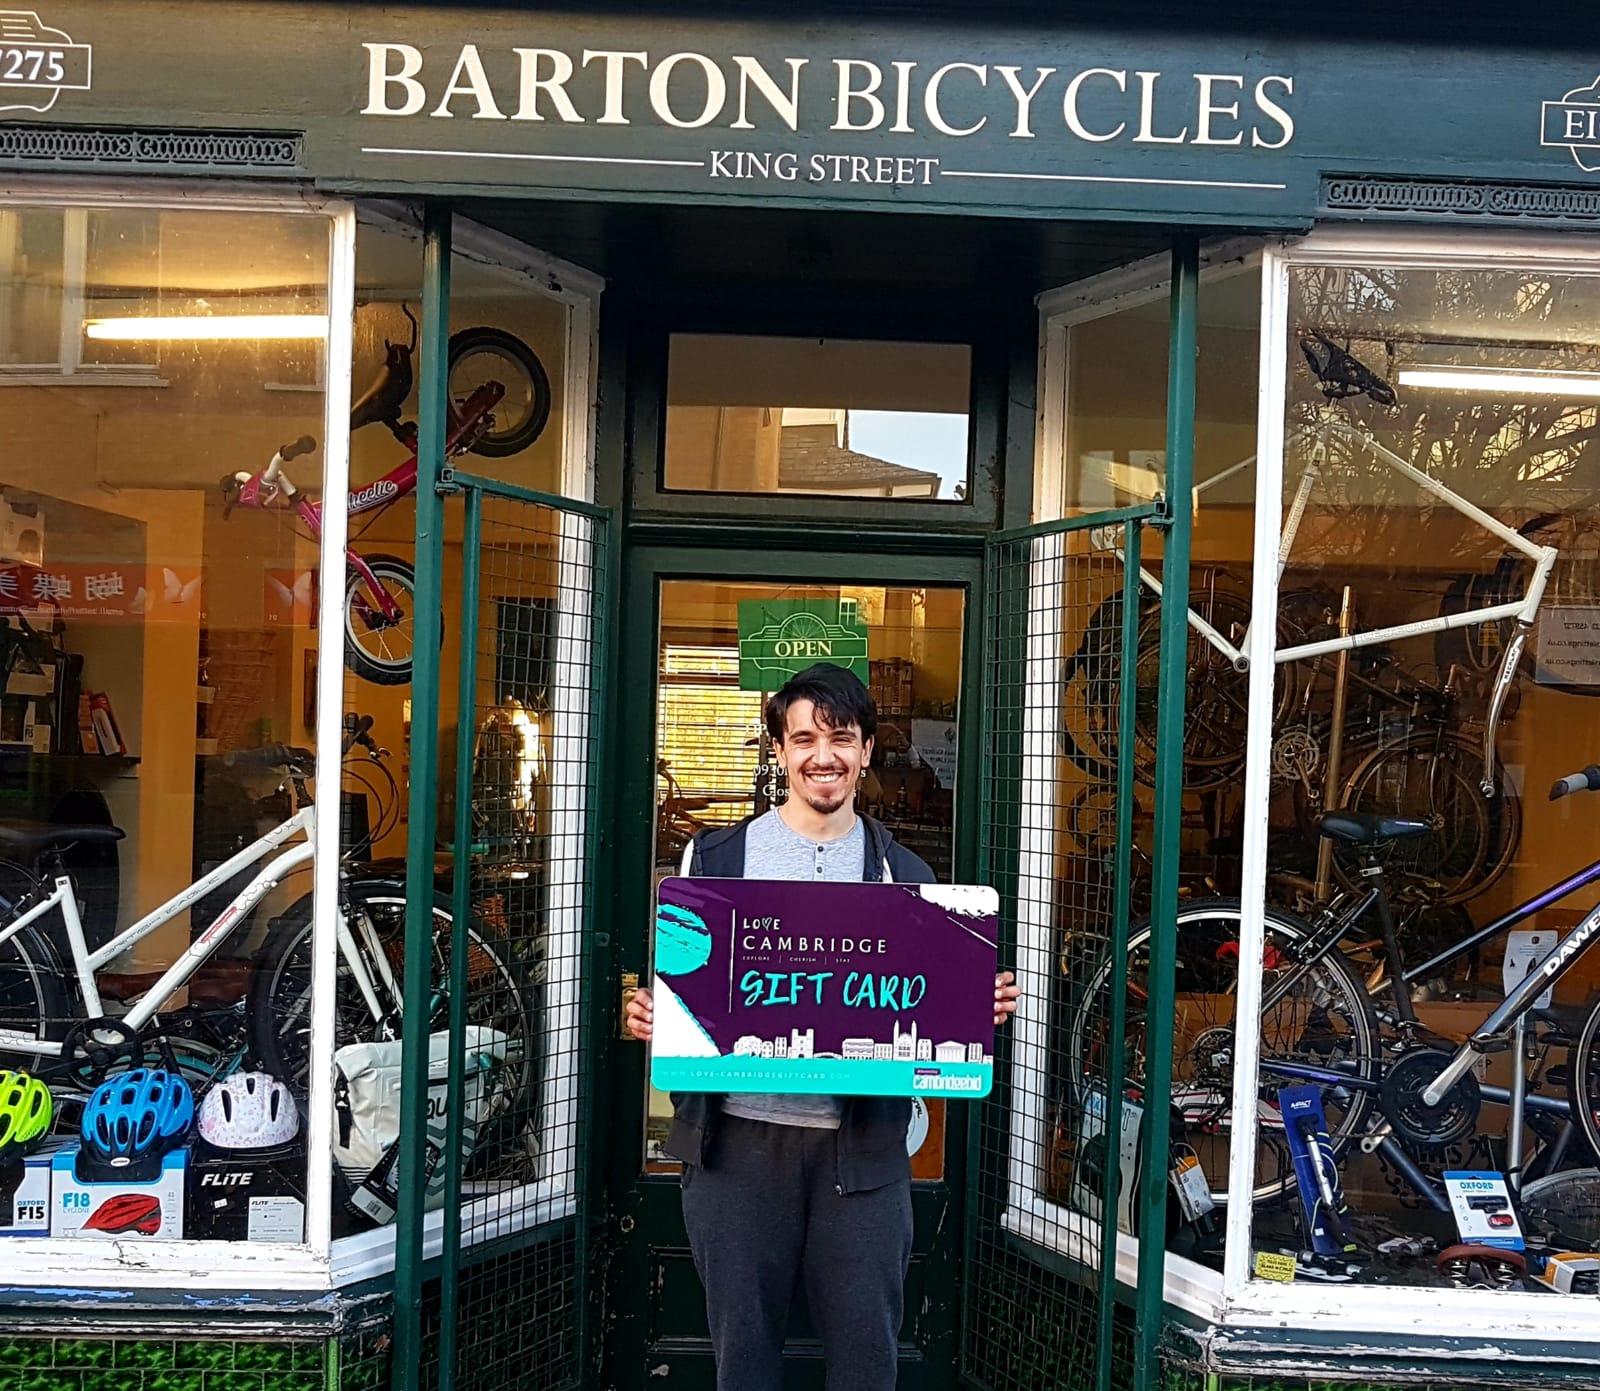 Barton Bicylces - Gift Card.JPG